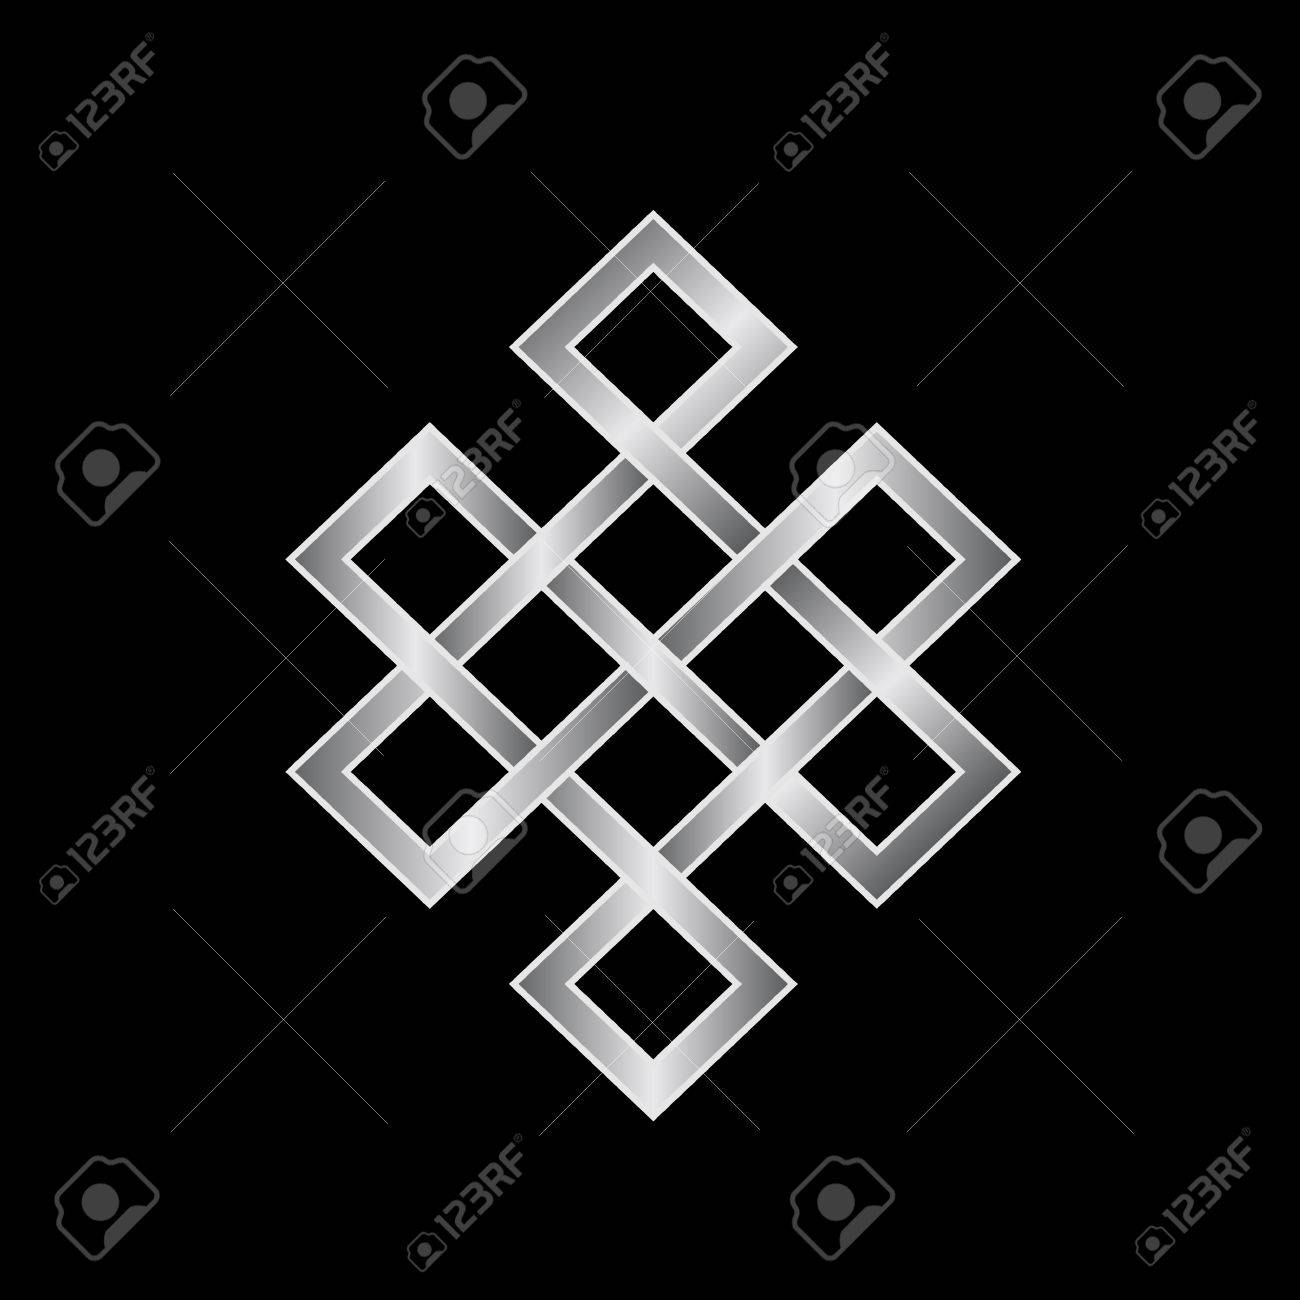 Platinum Endless Knot Concept Of Karma Time Spirituality Stock Vector